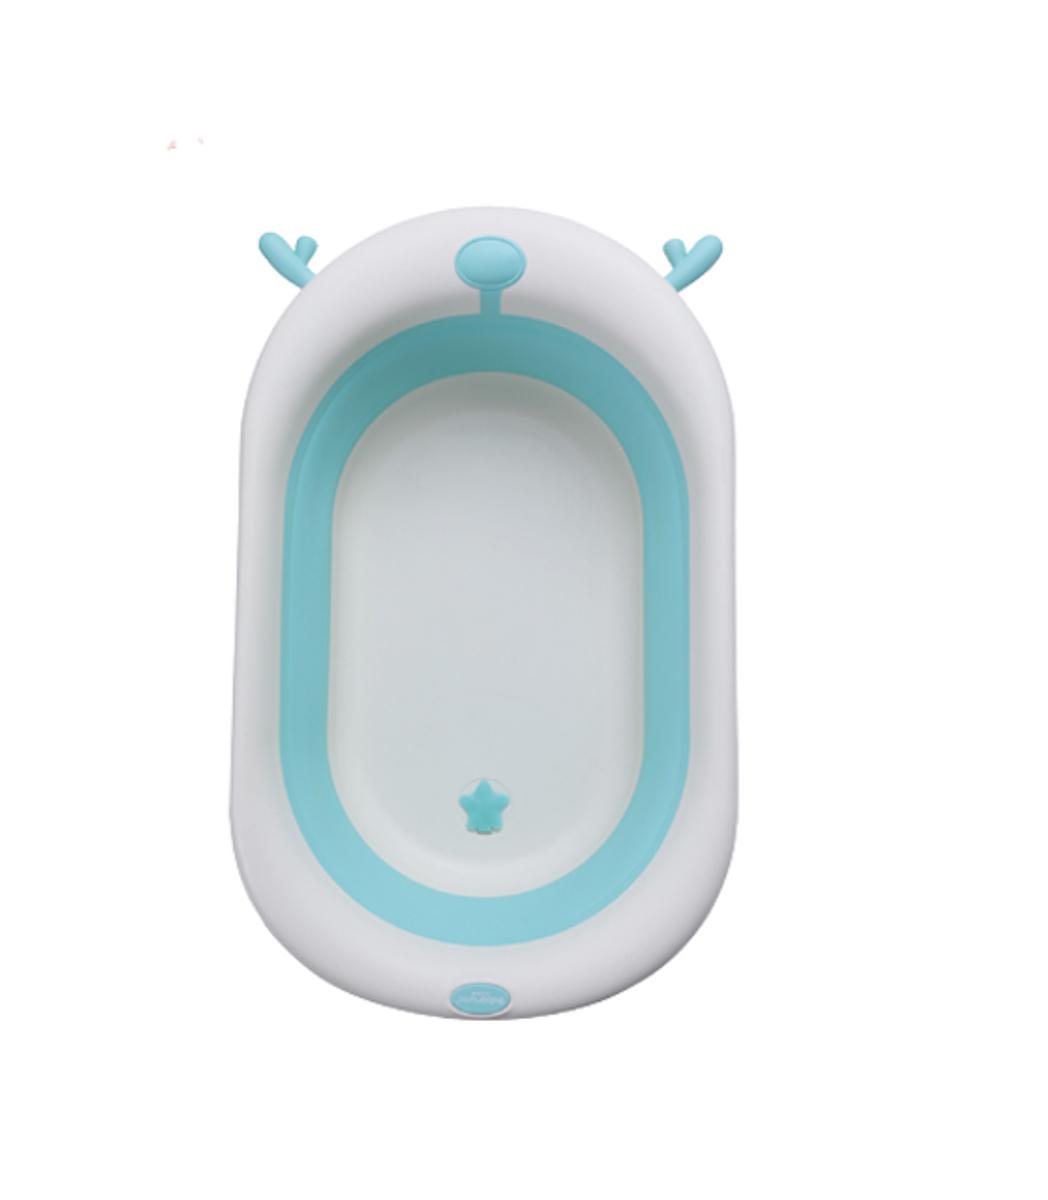 Badebalje Lux   Sammenleggbart   Aqua